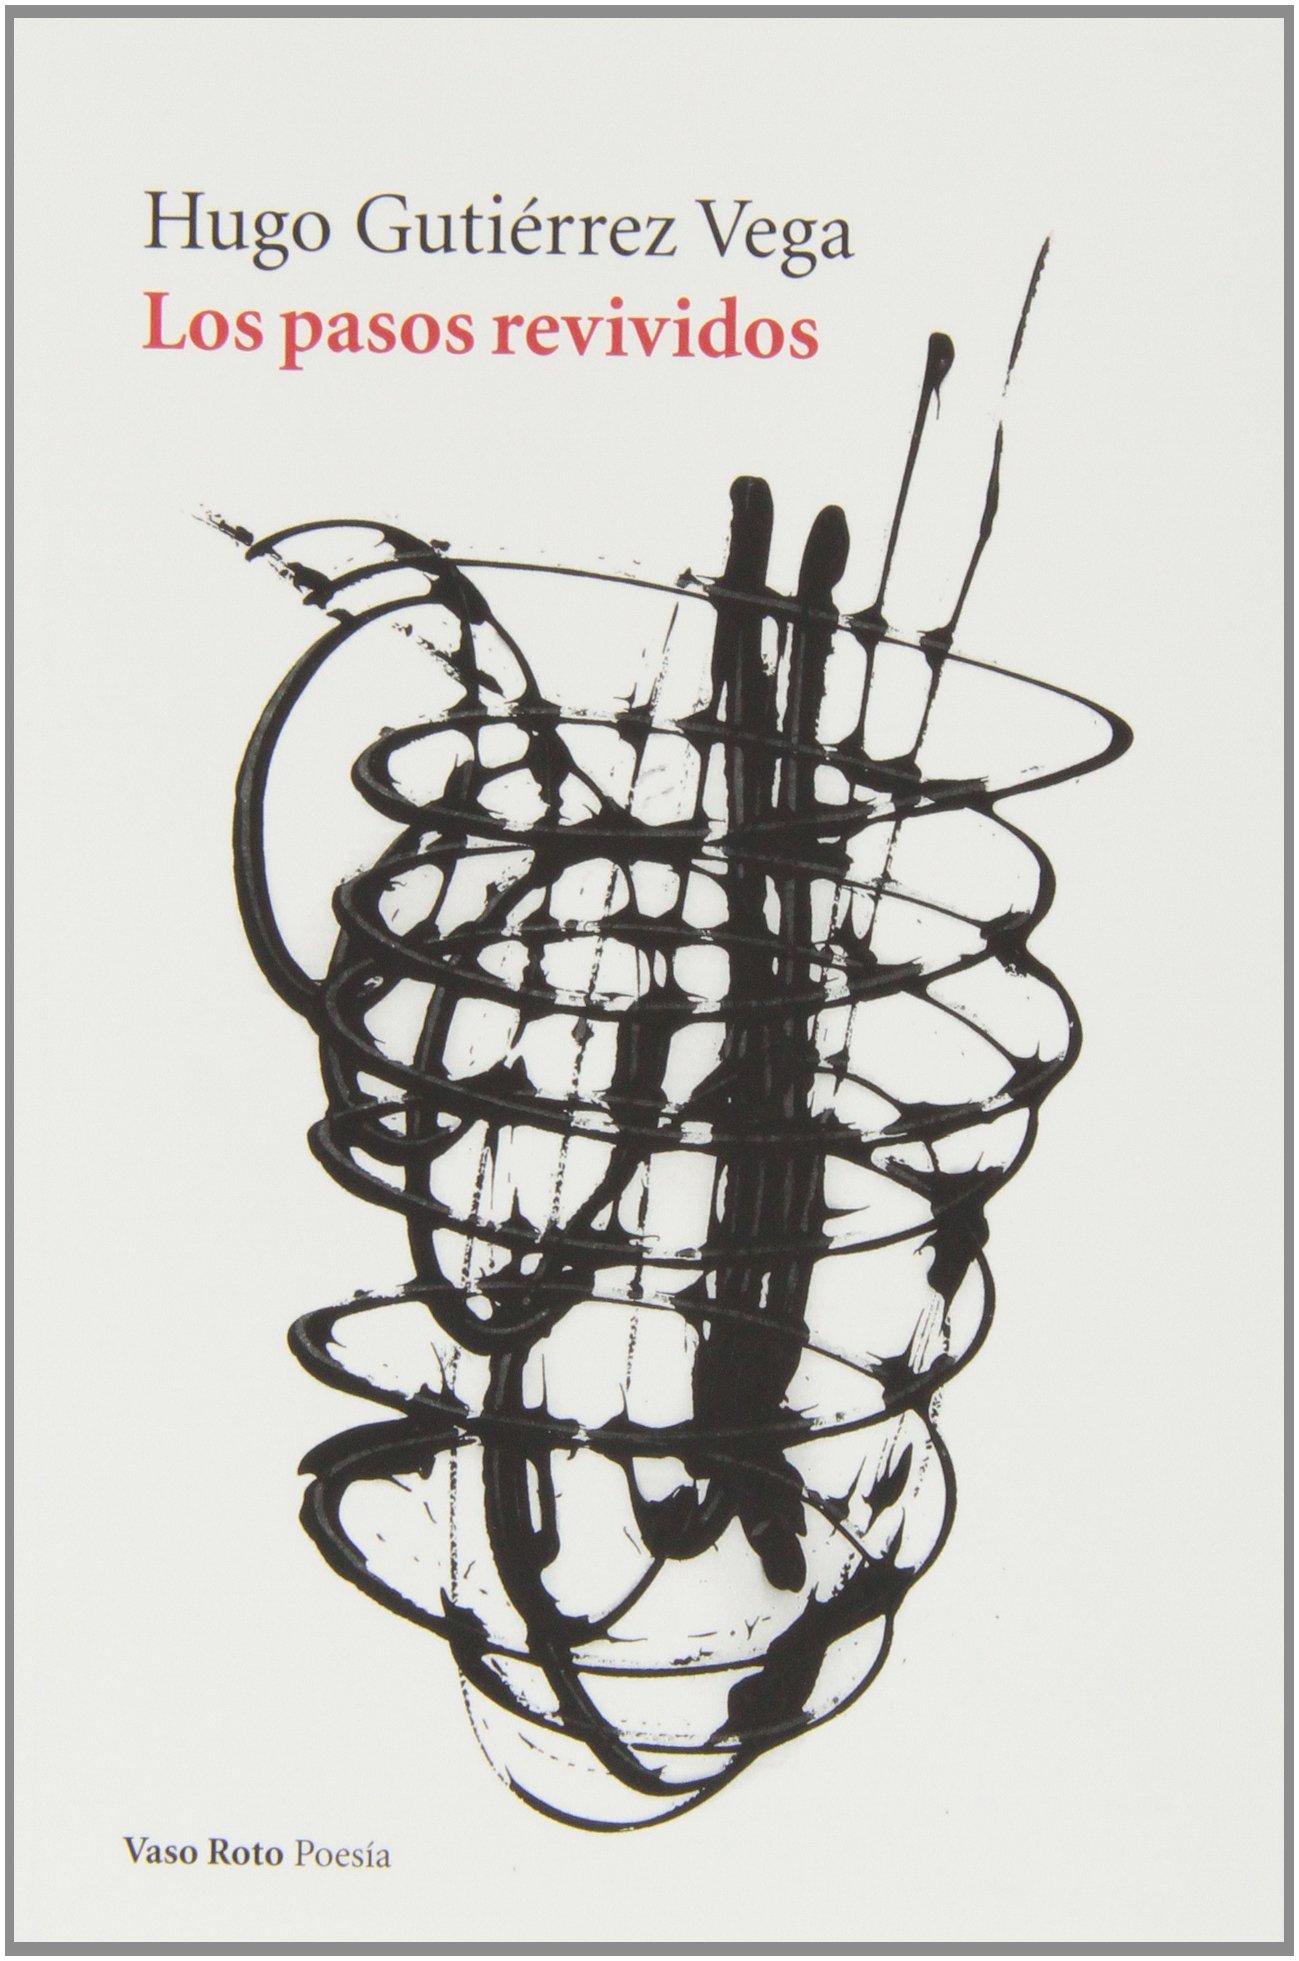 Los Pasos Revividos (Poesía) Tapa blanda – 4 oct 2013 Hugo Gutiérrez Vega Vaso Roto 8415168780 Mexico